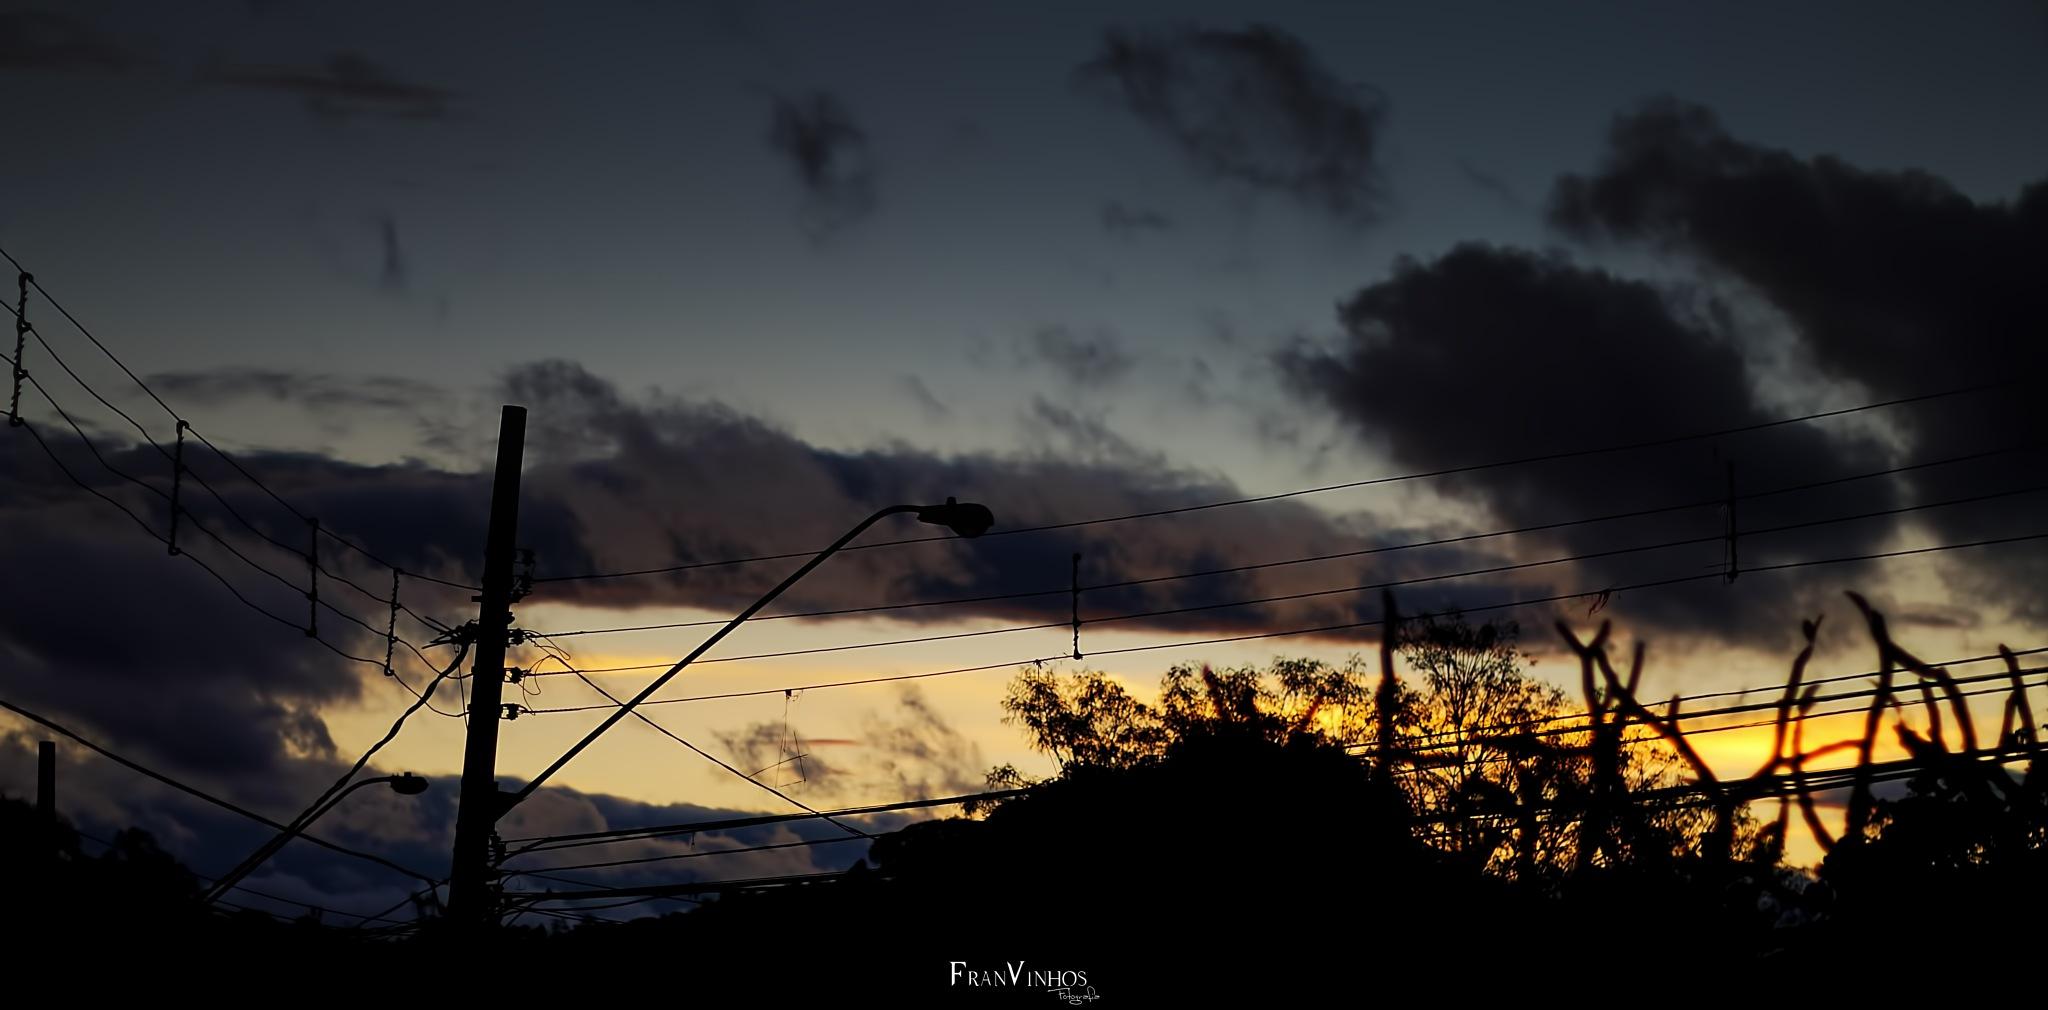 Untitled by franvinhos